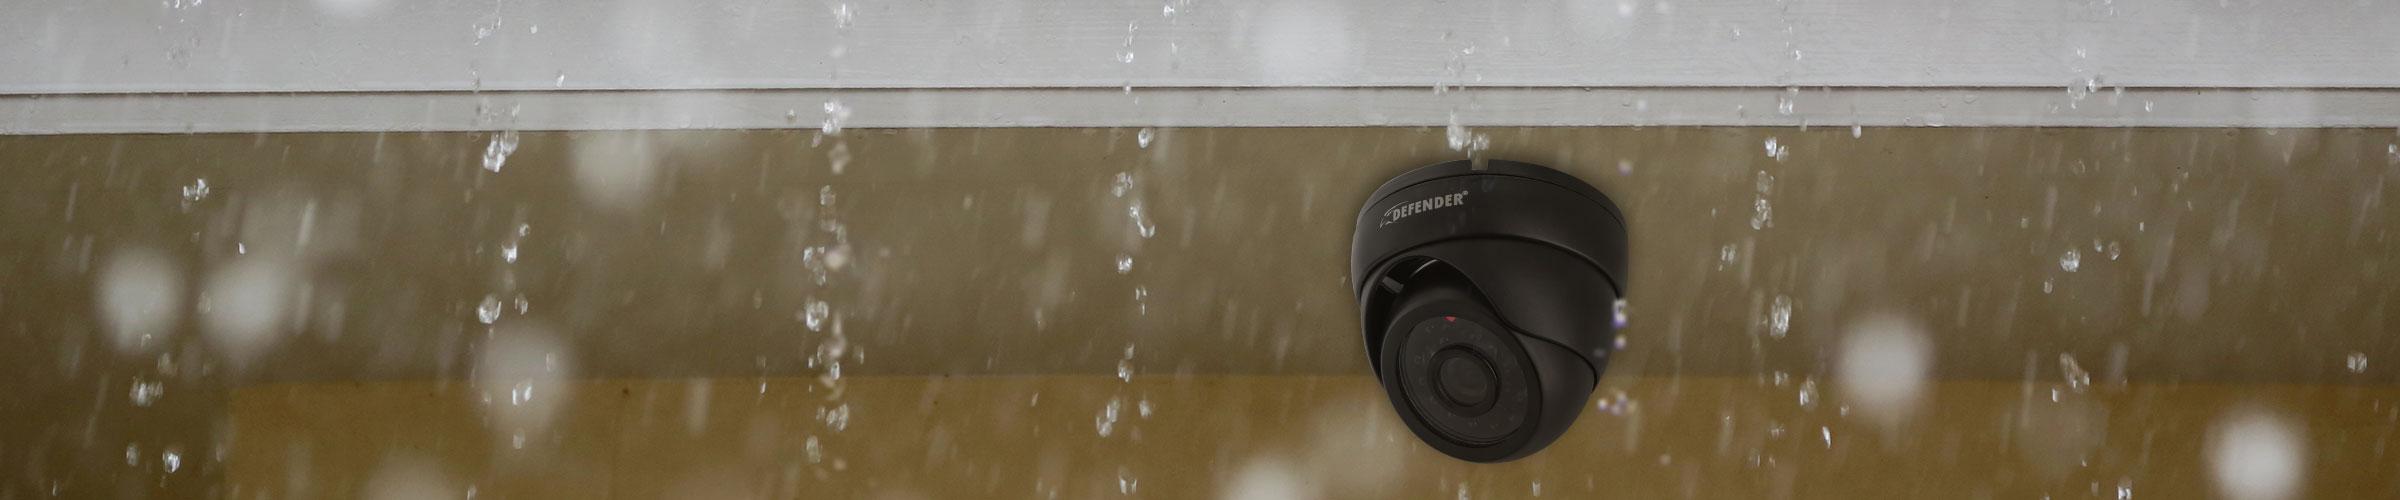 weather resistant housing provides range of versatile usage